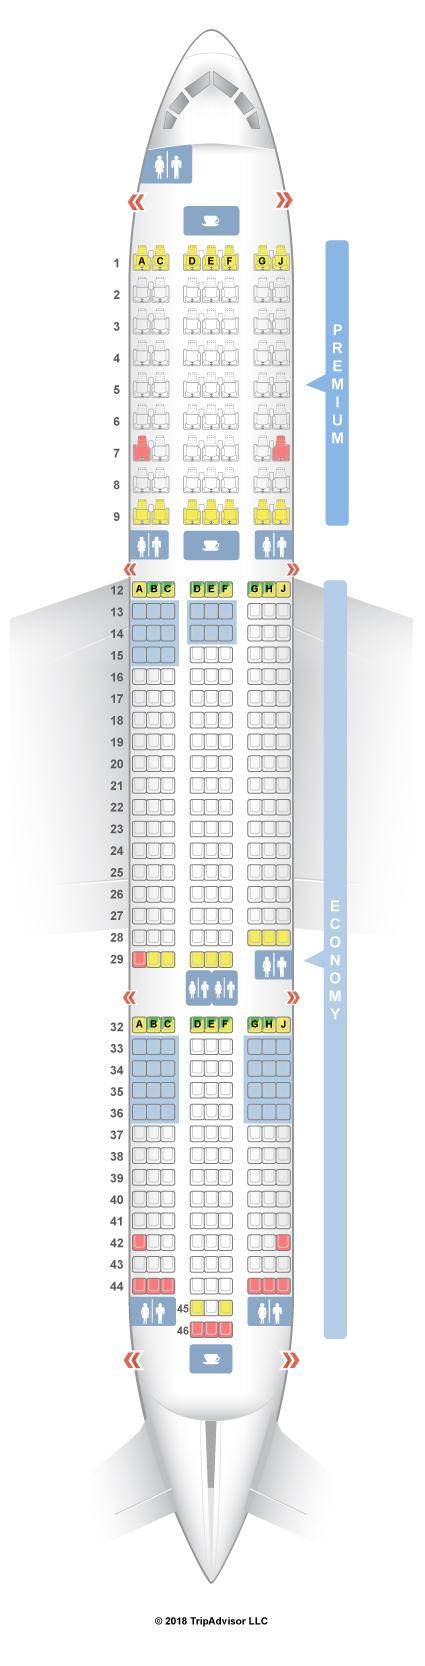 Seating Plan 787 Dreamliner | Elcho Table